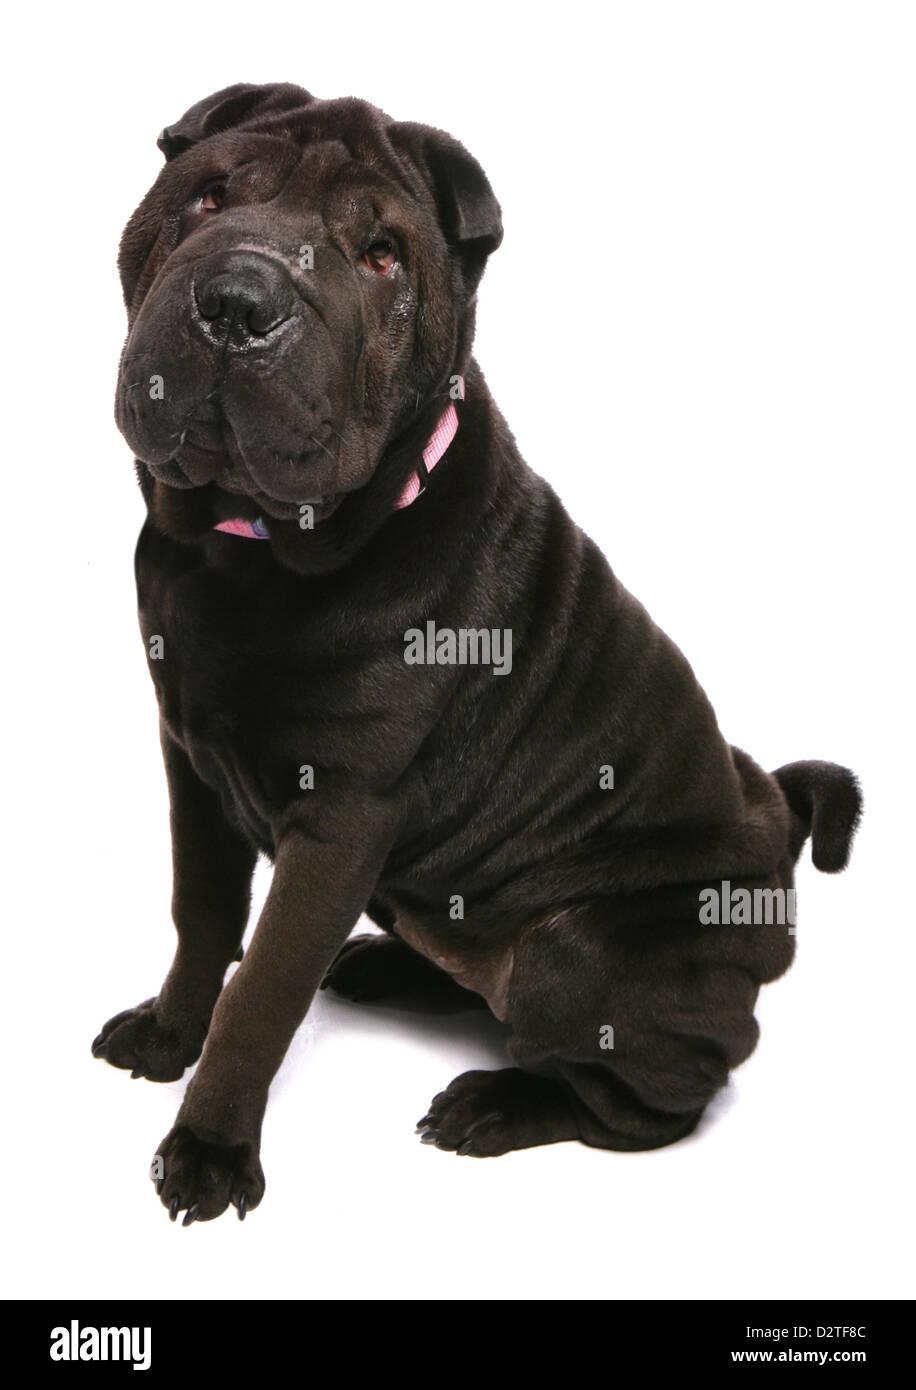 shar pei dog studio cutout - Stock Image